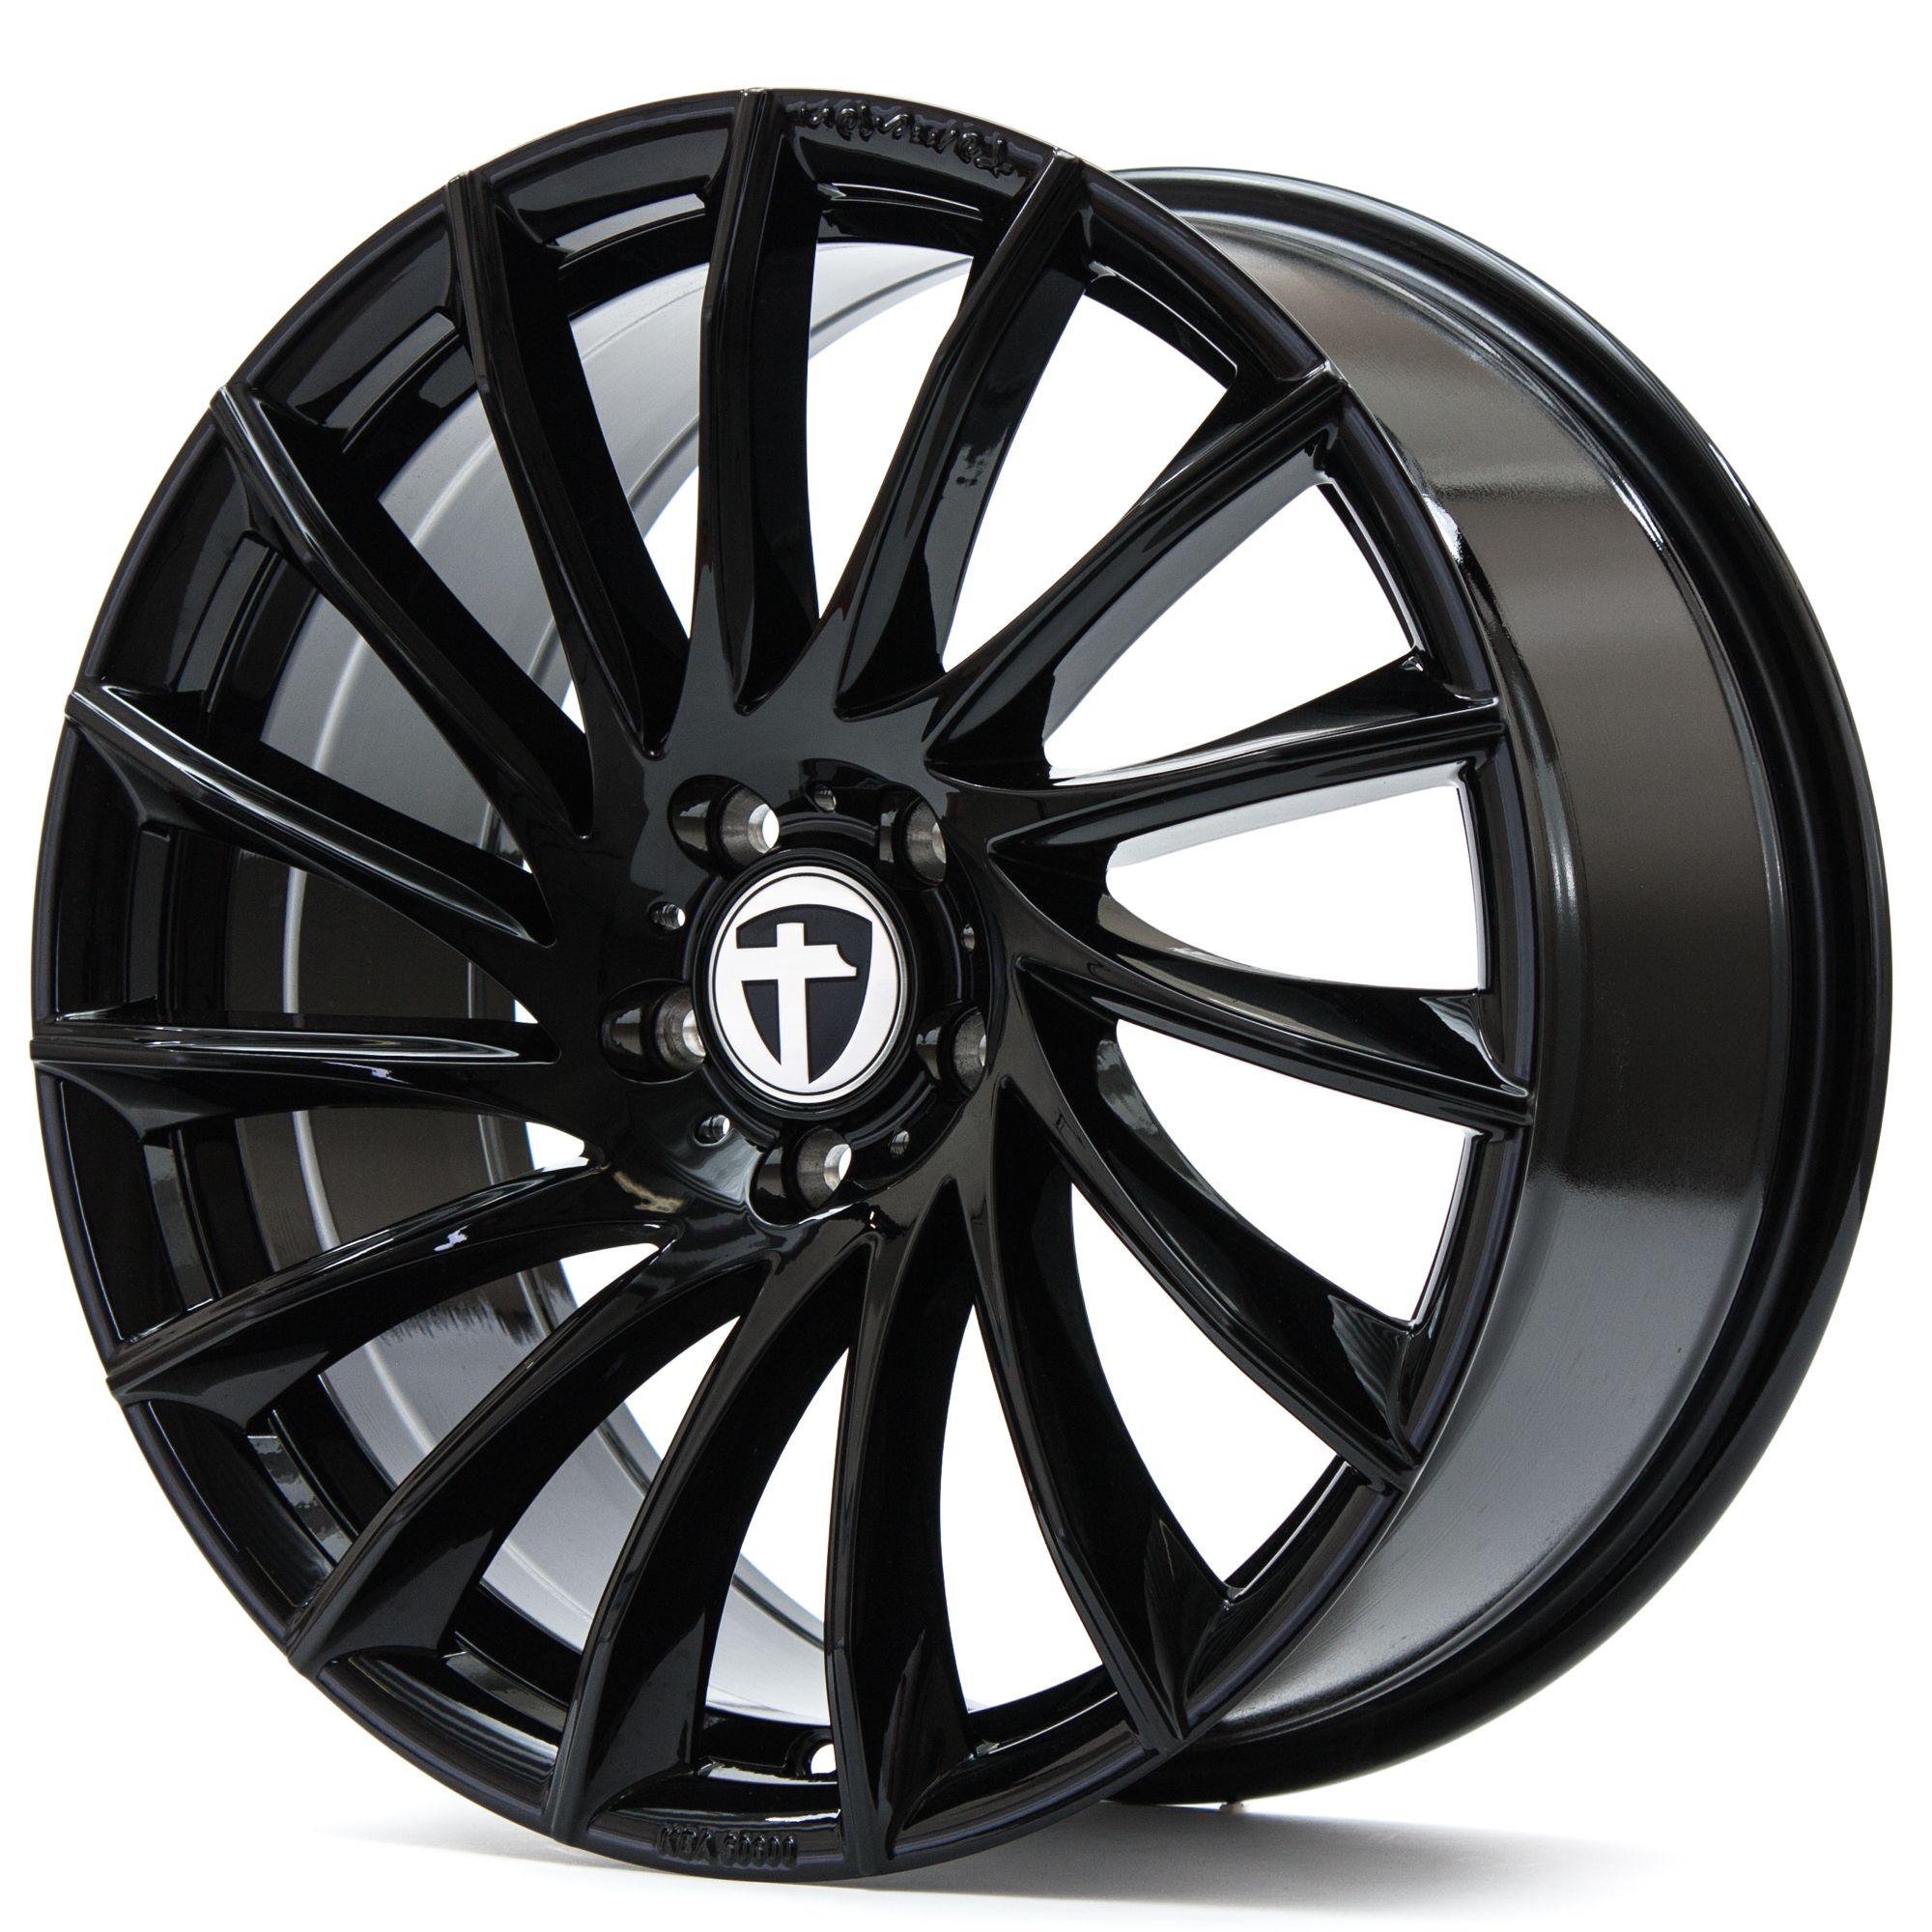 tomason tn16 felgen black painted schwarz in 17 zoll. Black Bedroom Furniture Sets. Home Design Ideas